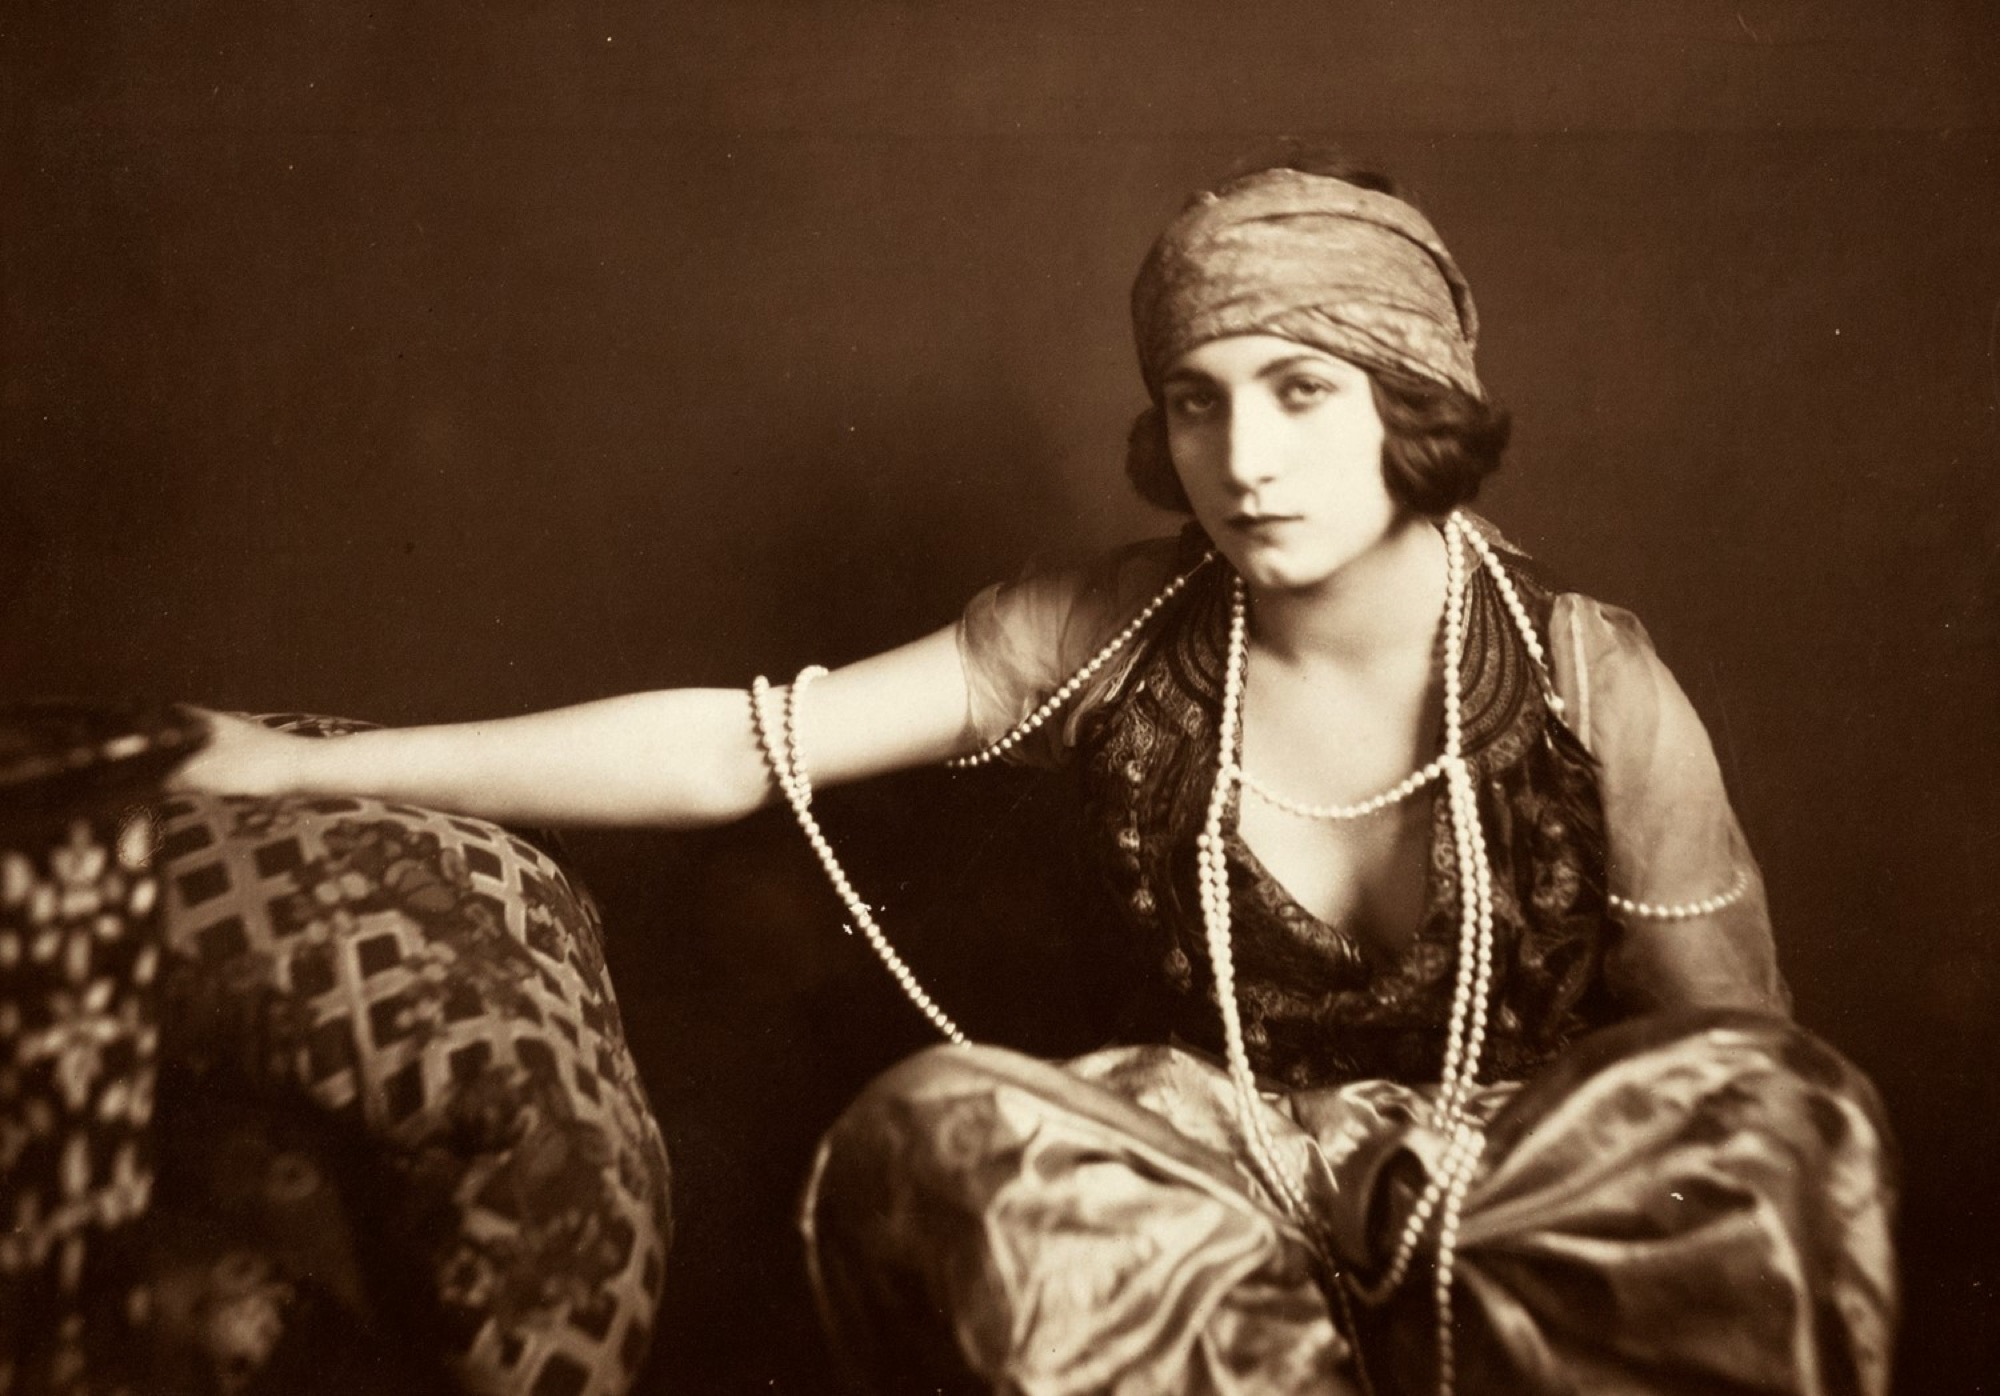 Anonimo - Untitled (Woman portrait), years 1920 - Vintage gelatin silver print, [...]